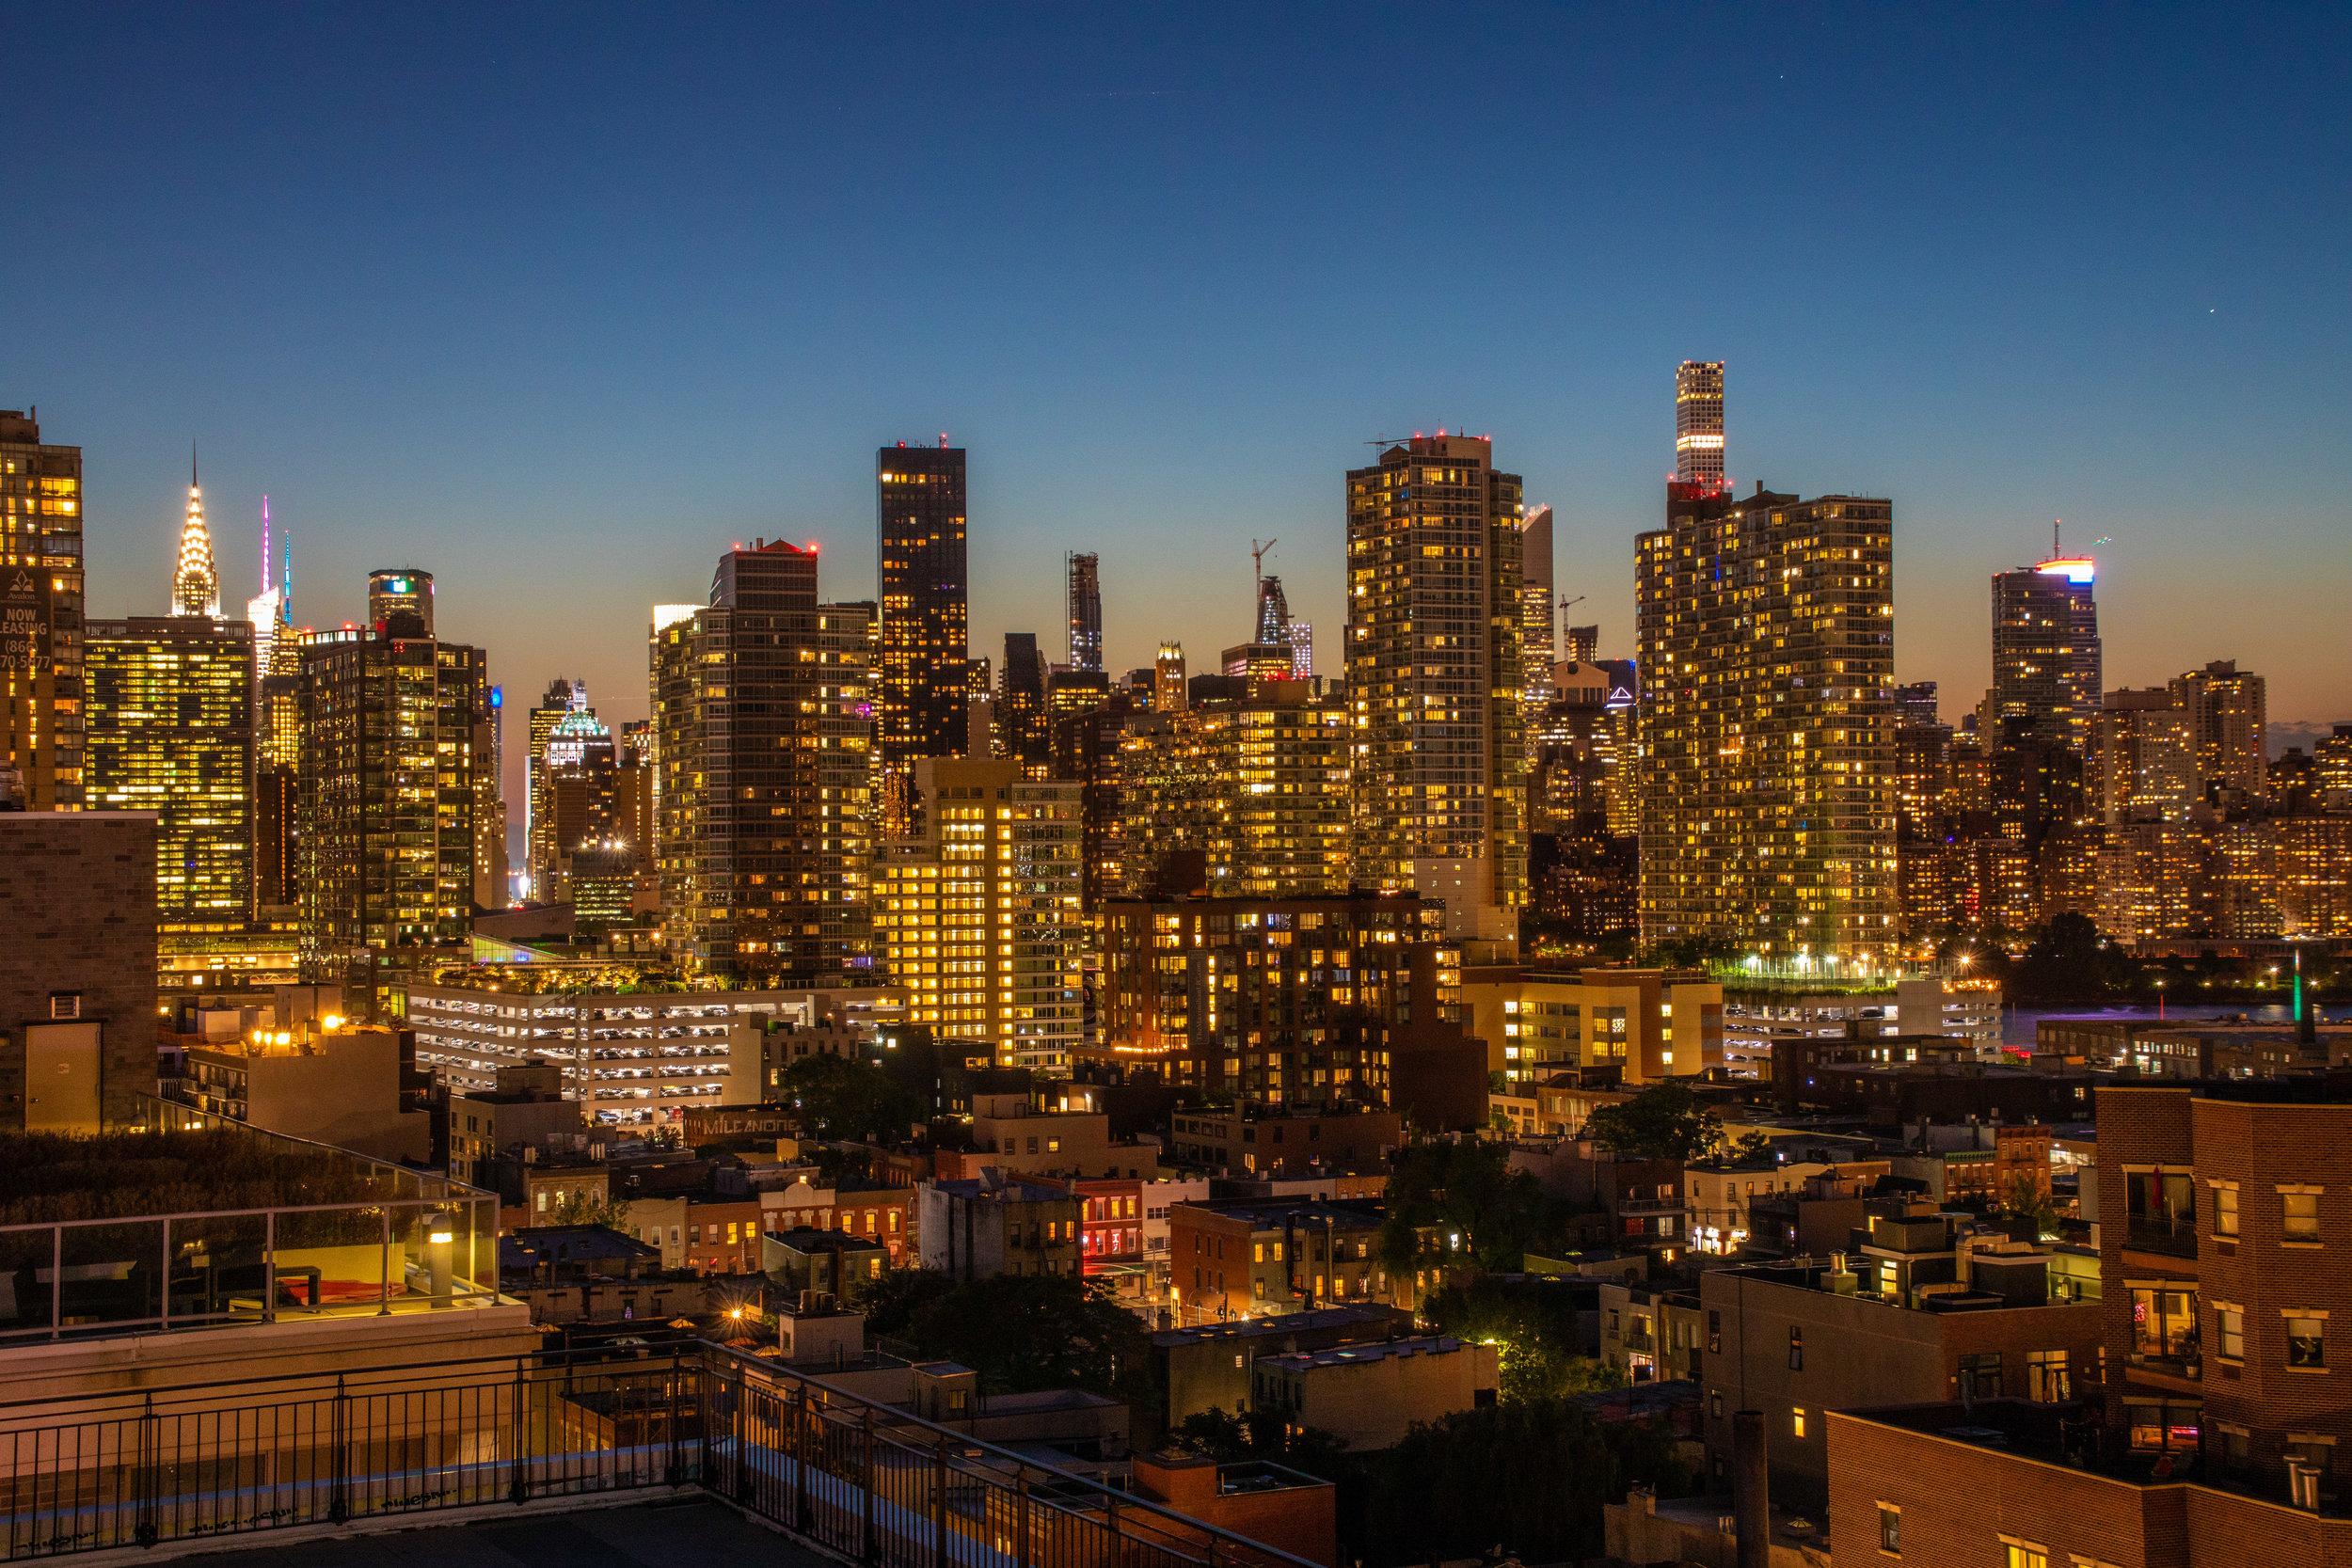 LSNY_Night_City_Views-33.jpg